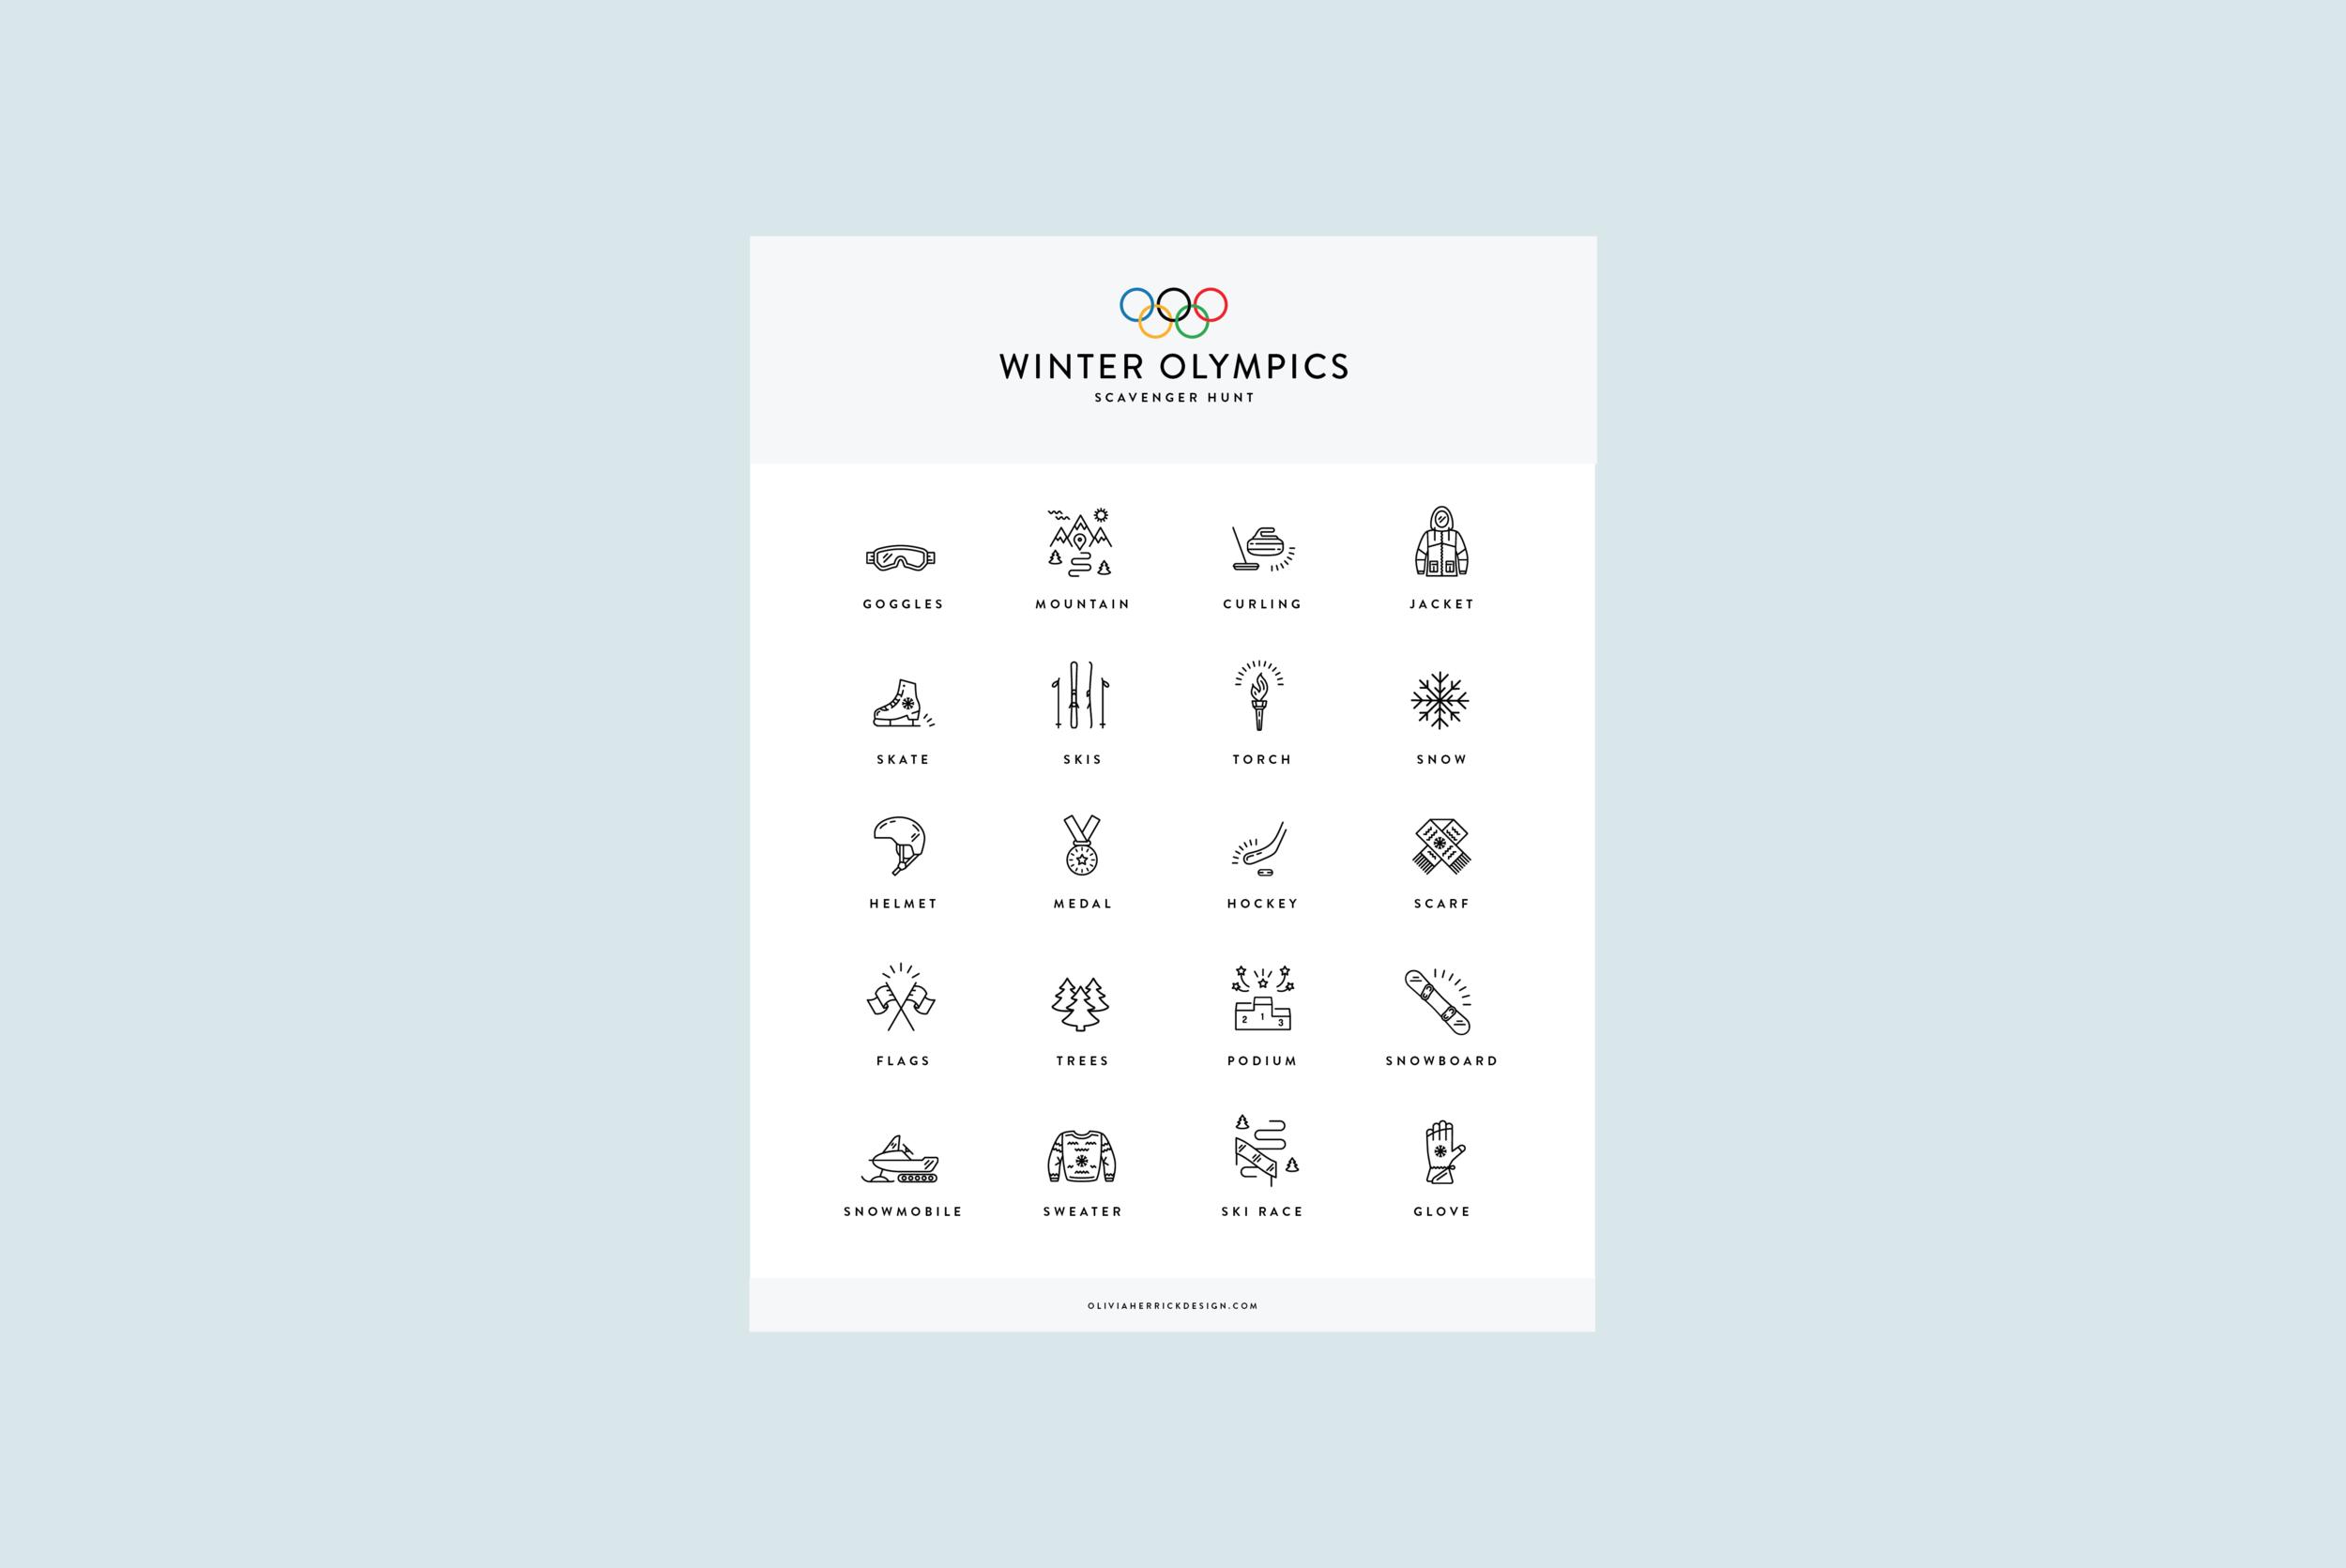 olivia-herrick-design-olympic-printable.png